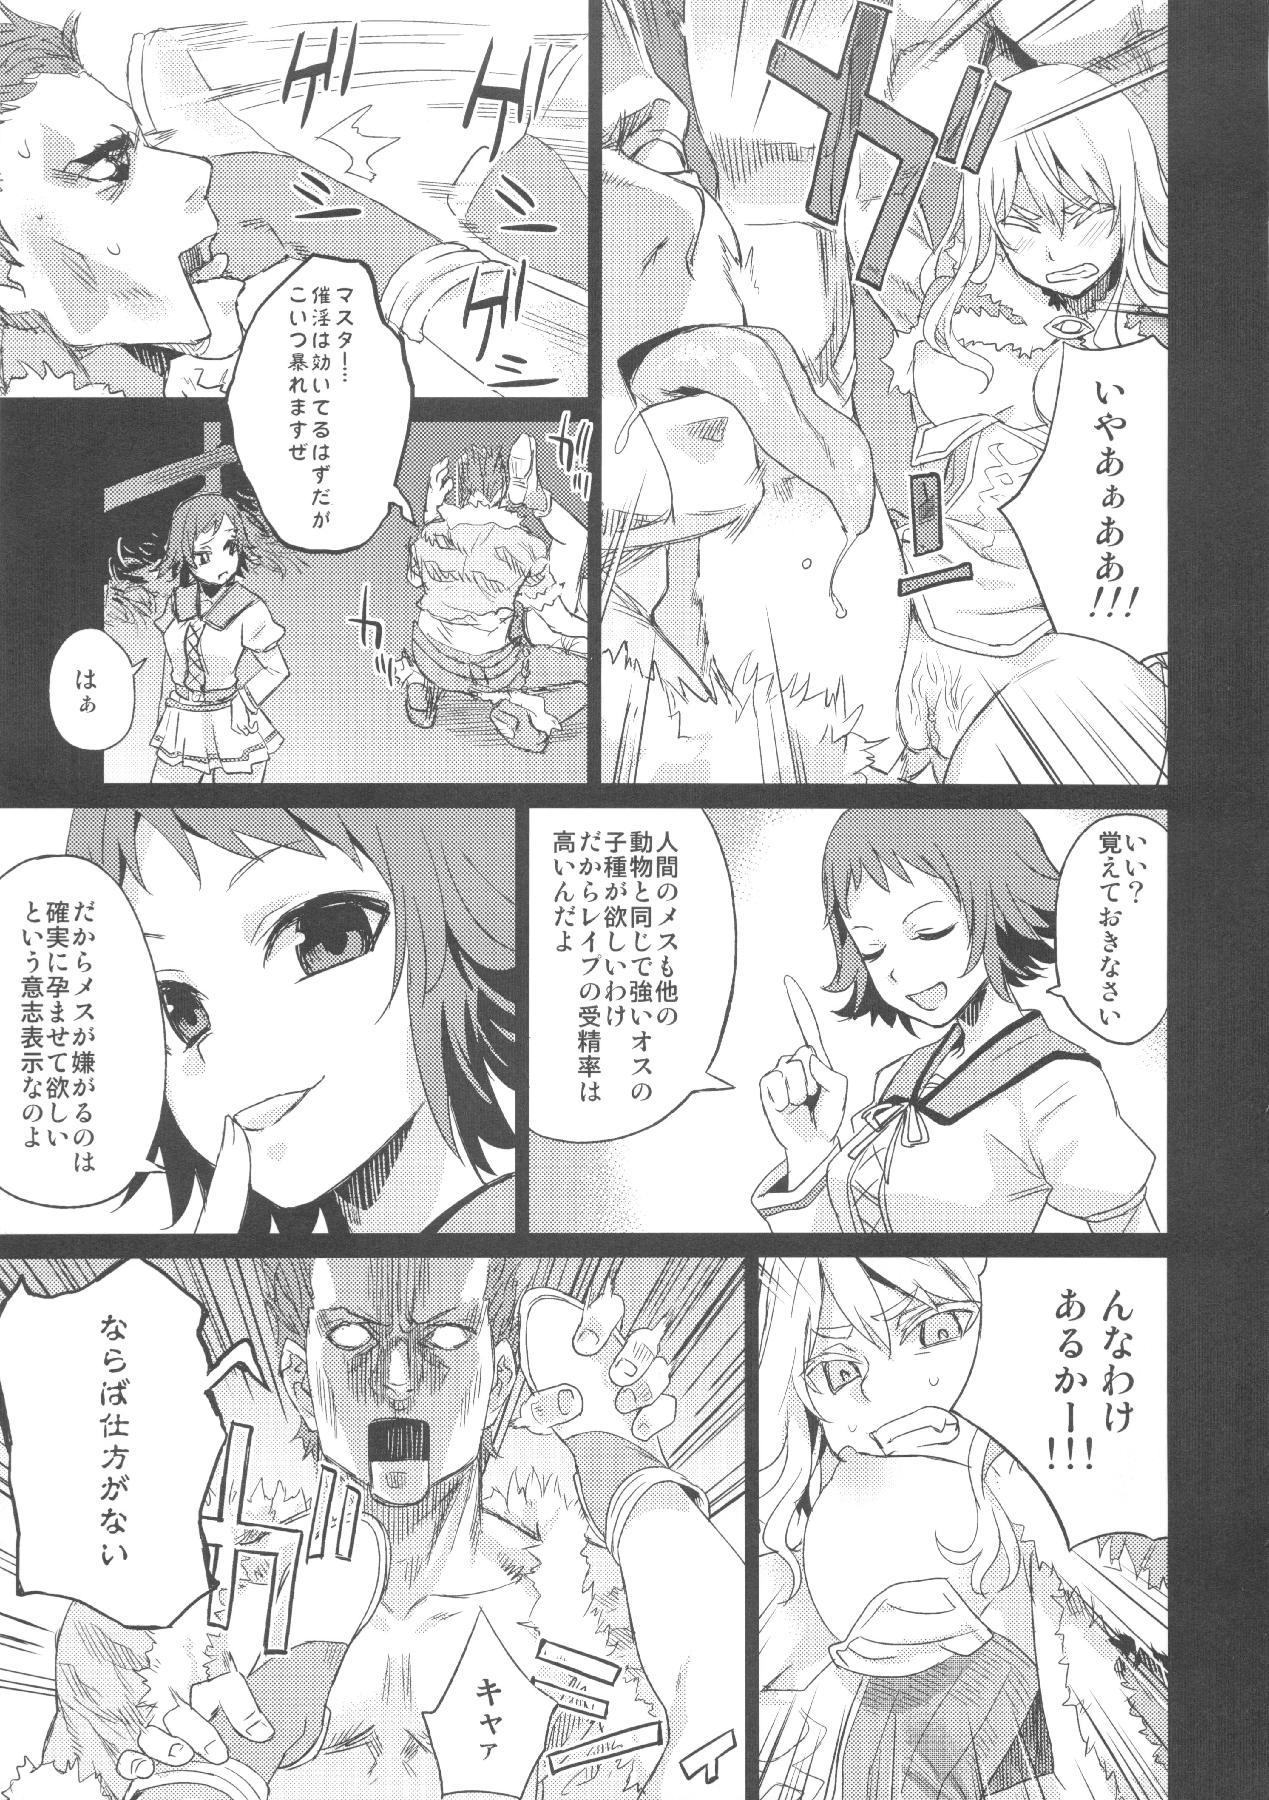 (C83) [Fatalpulse (Asanagi)] VictimGirls Compiled Vol.1 -Victimgirls Soushuuhen 1- MMO Game Selection (Various) 33